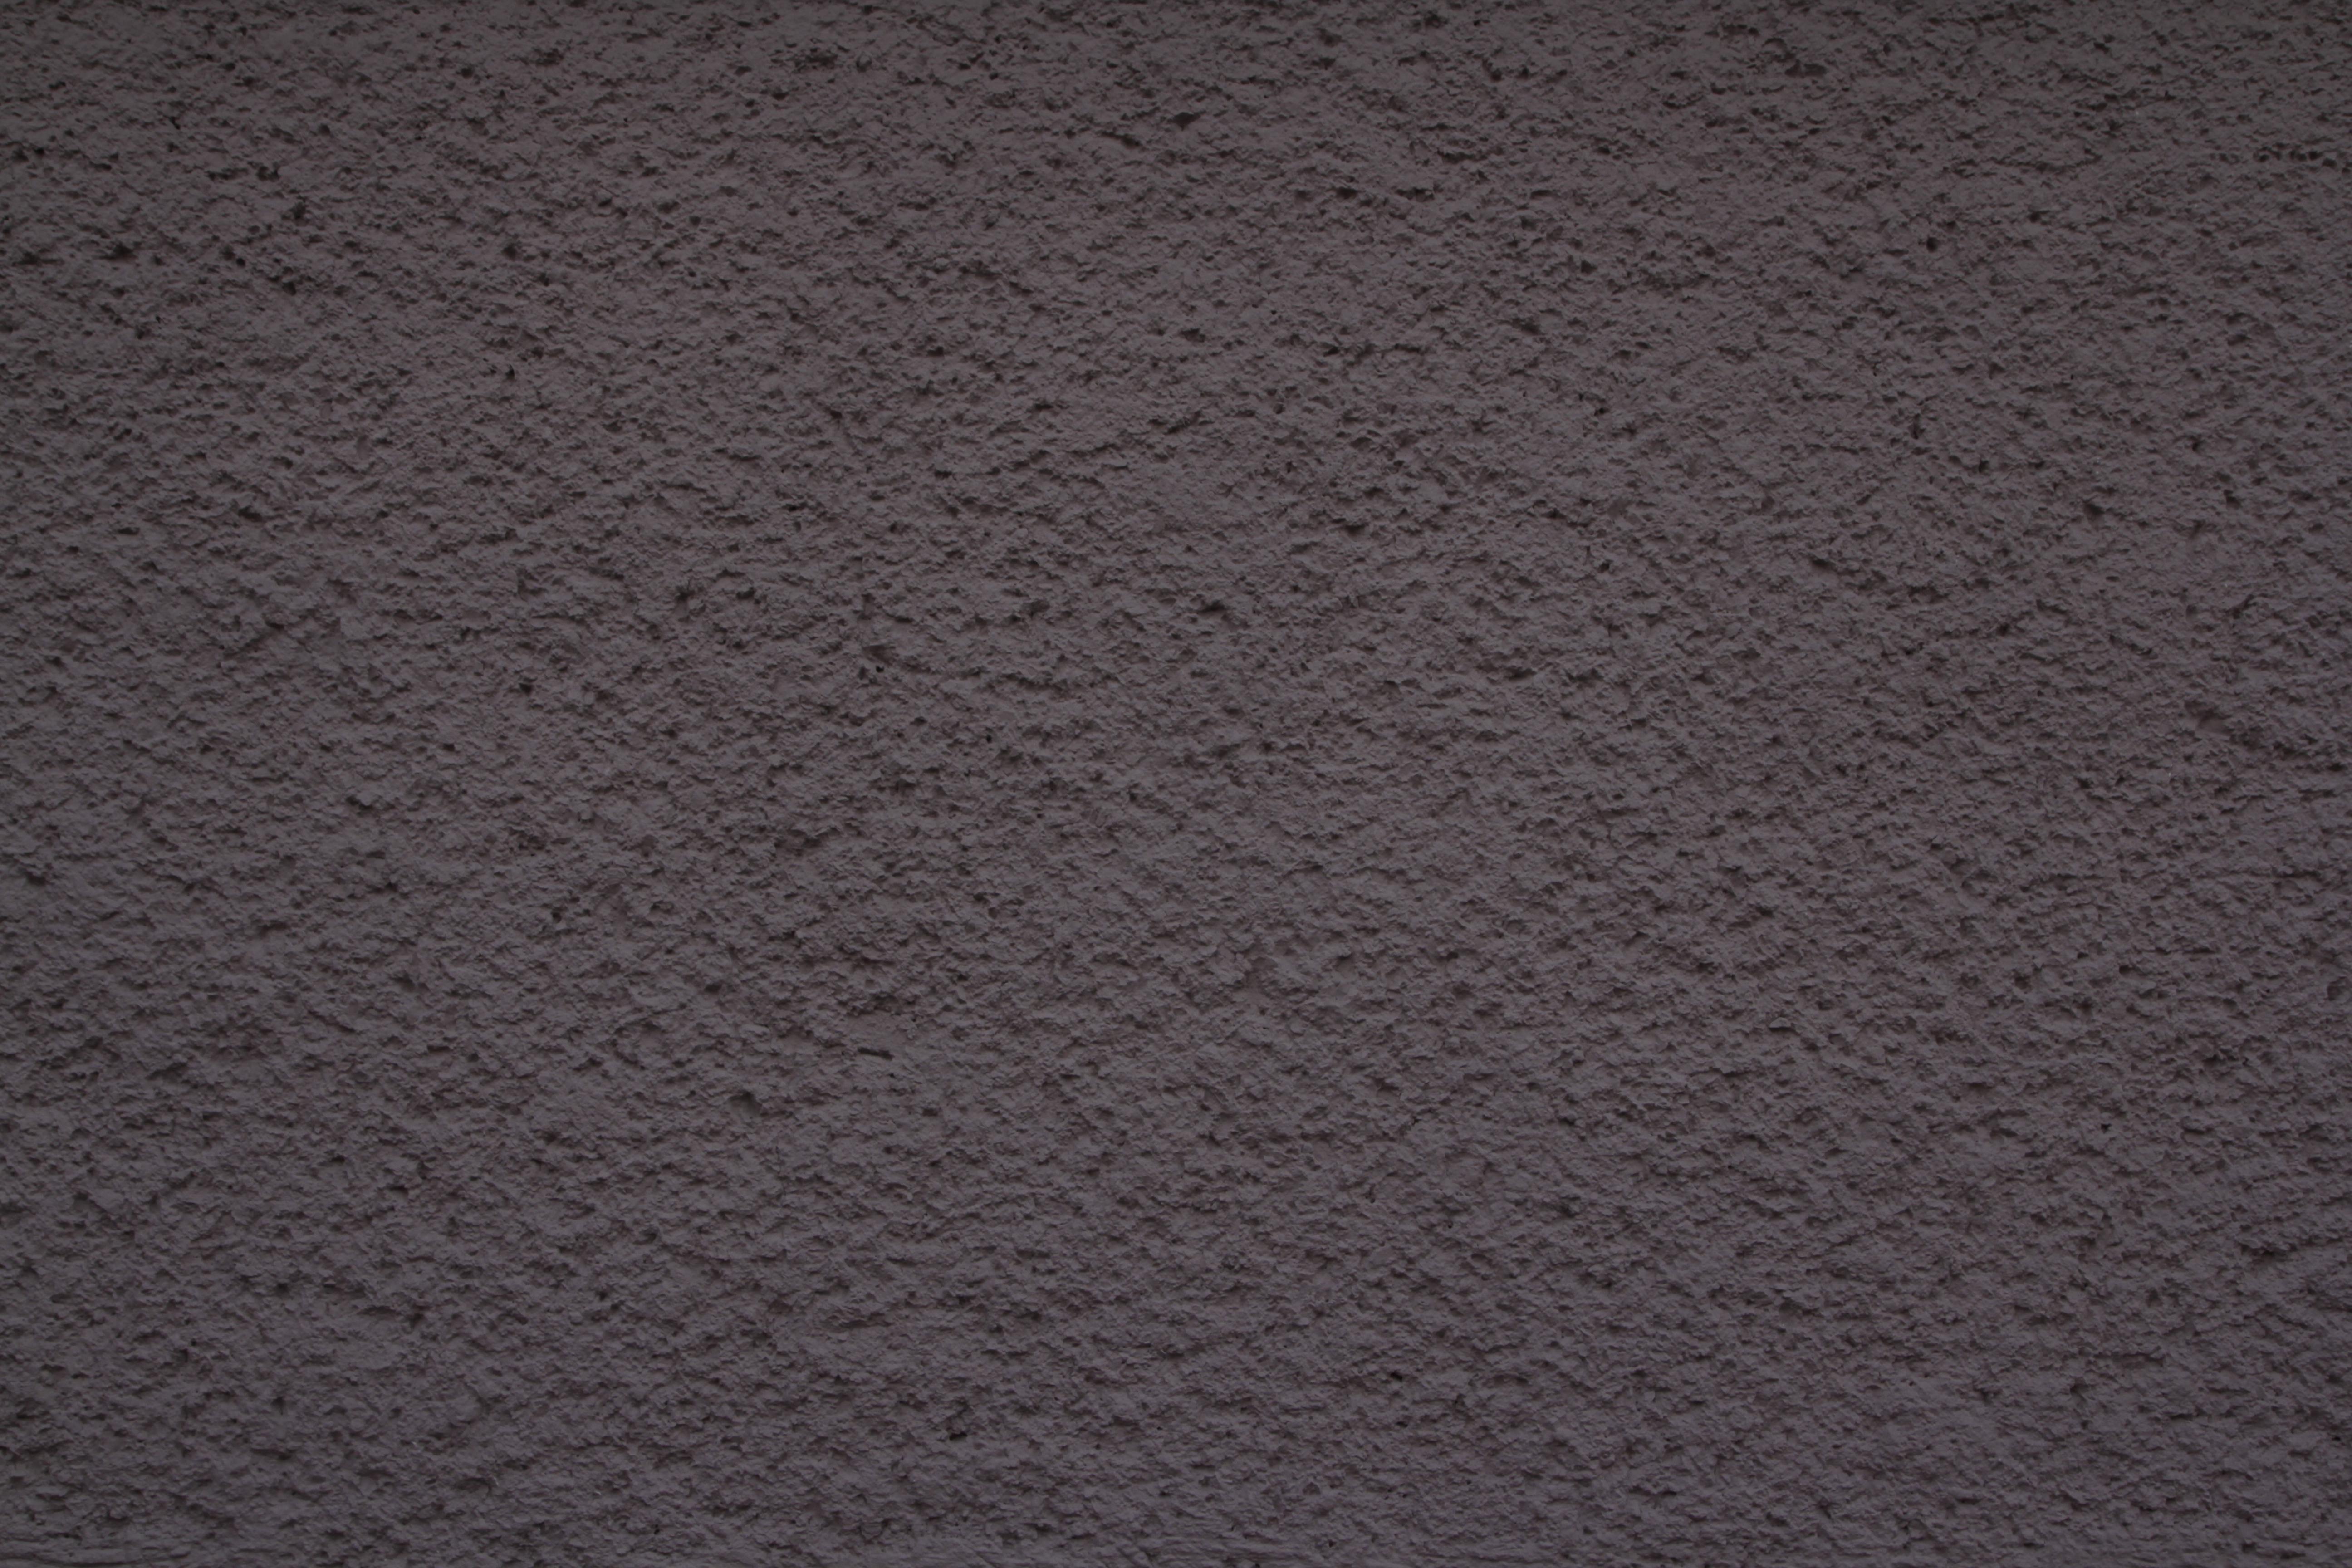 Dark Grey Painted Concrete Wall Concrete Texturify